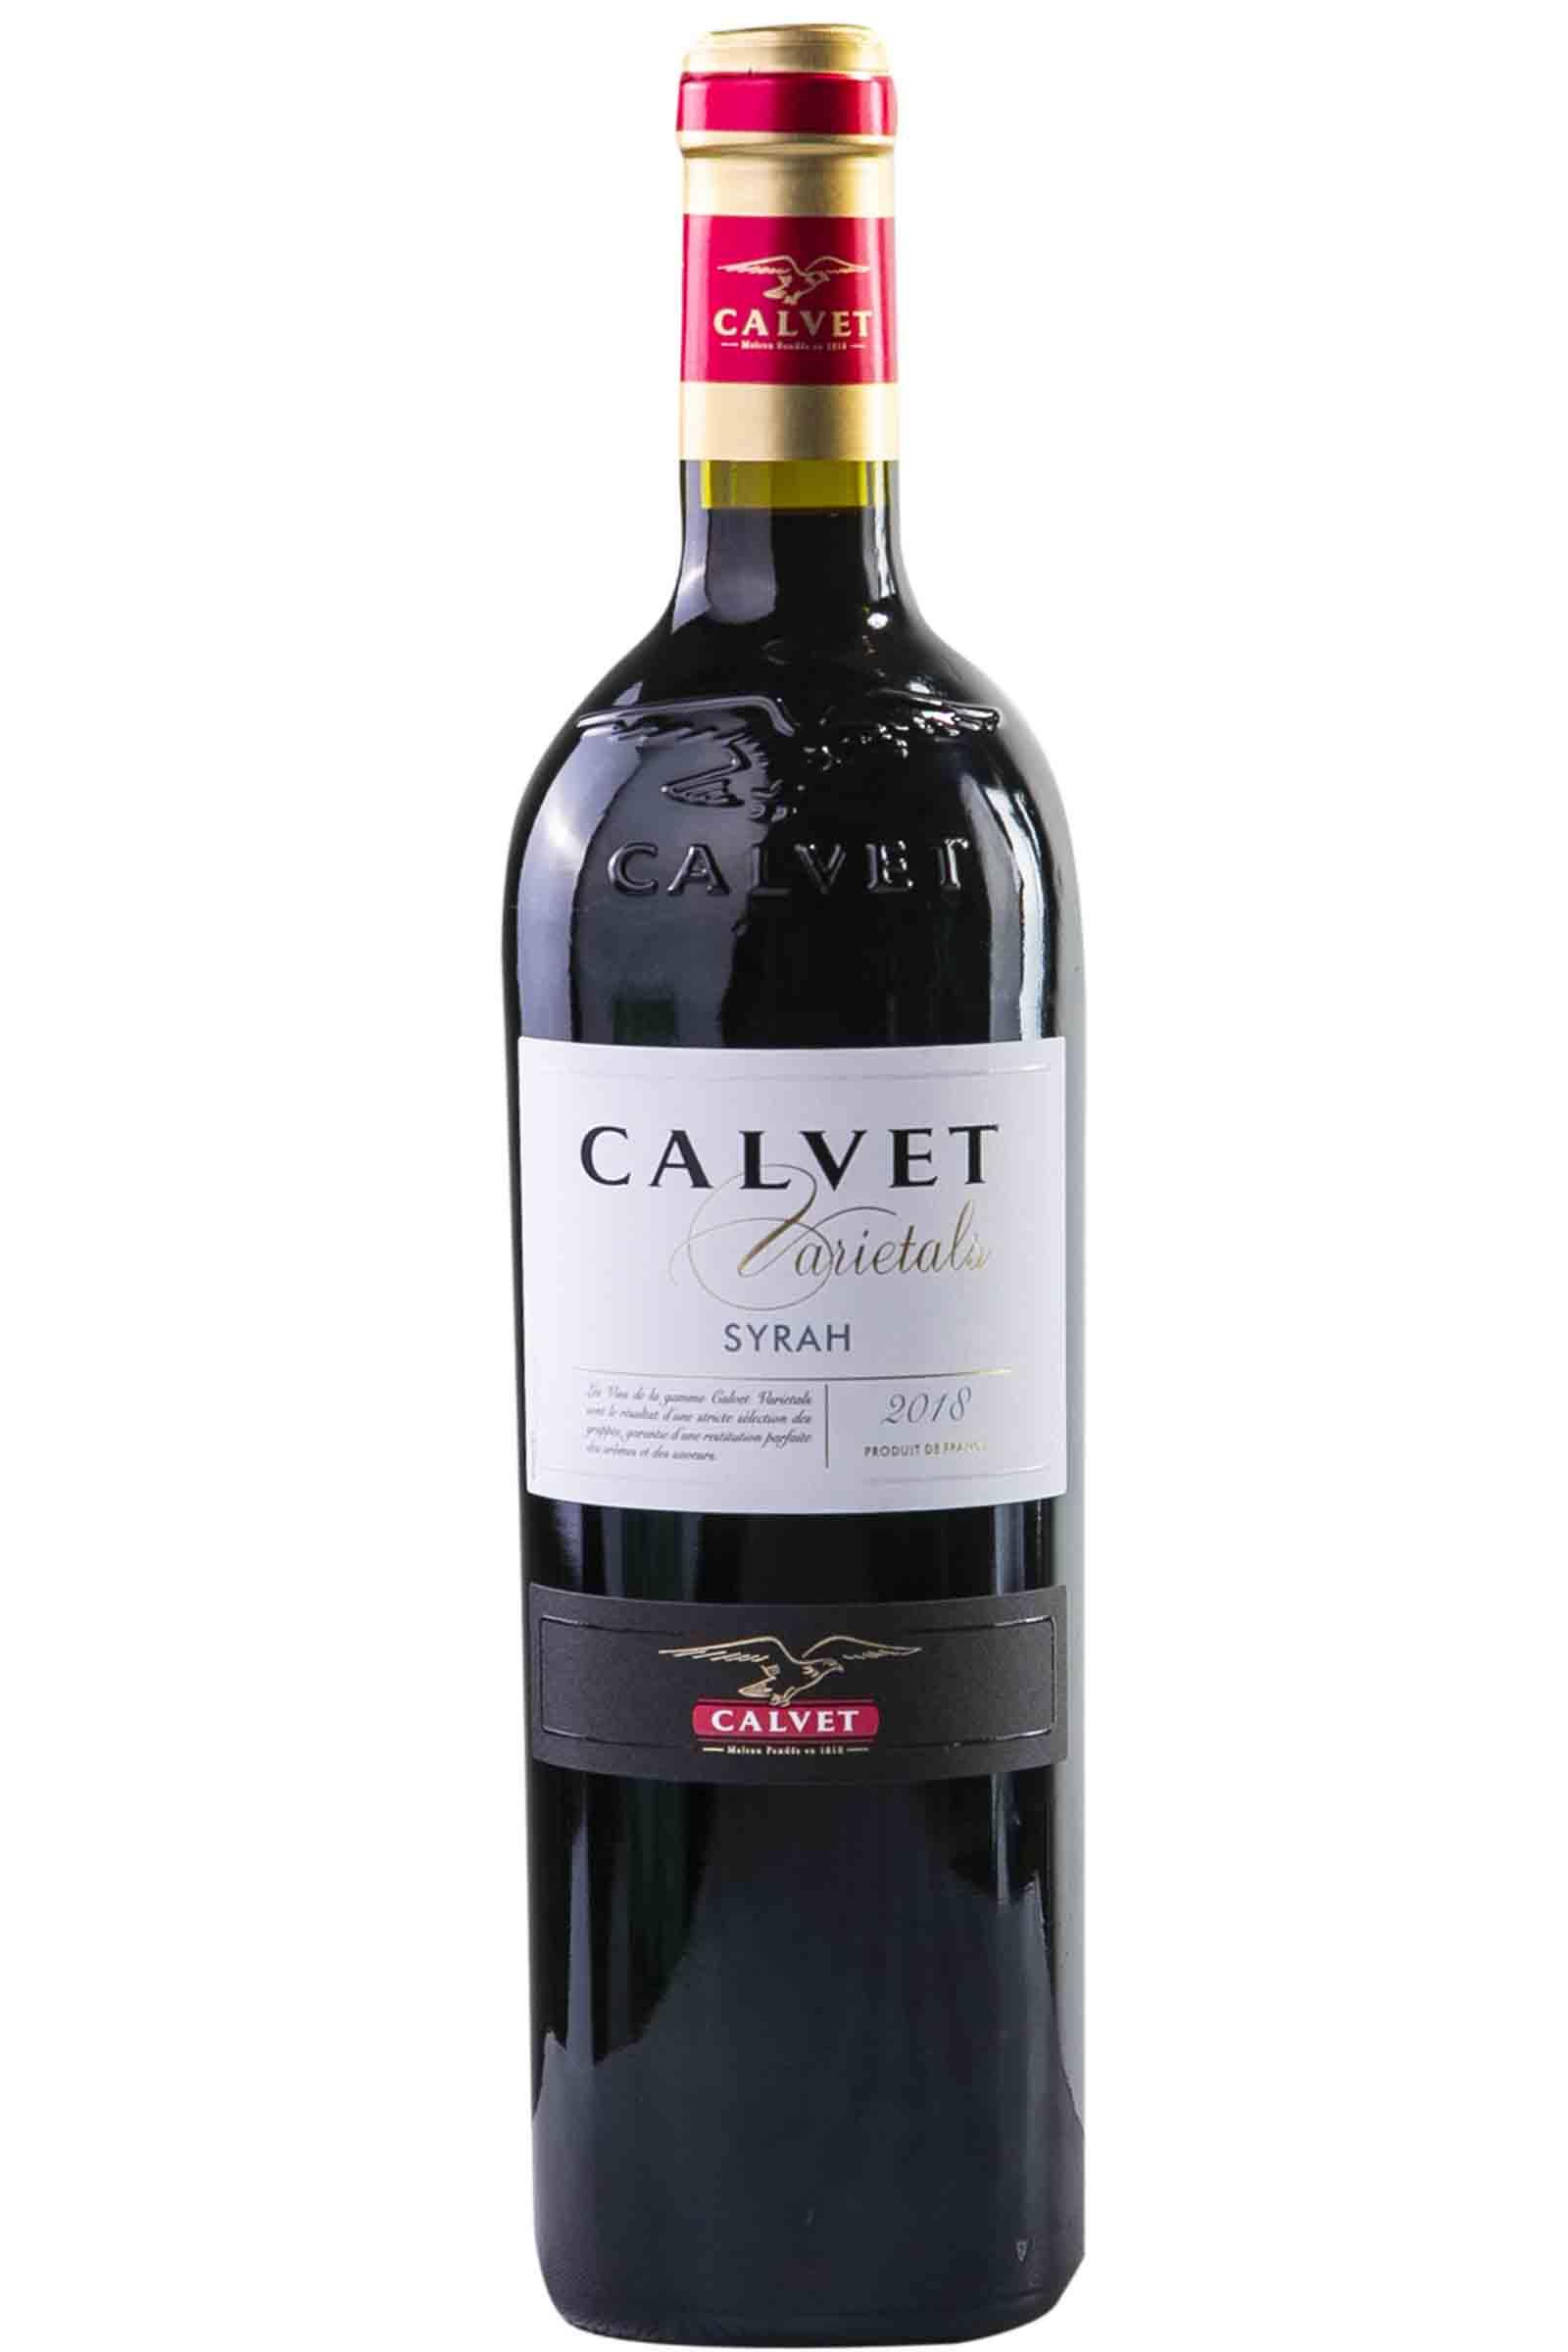 Vino Calvet Varietal Syrah 750ml